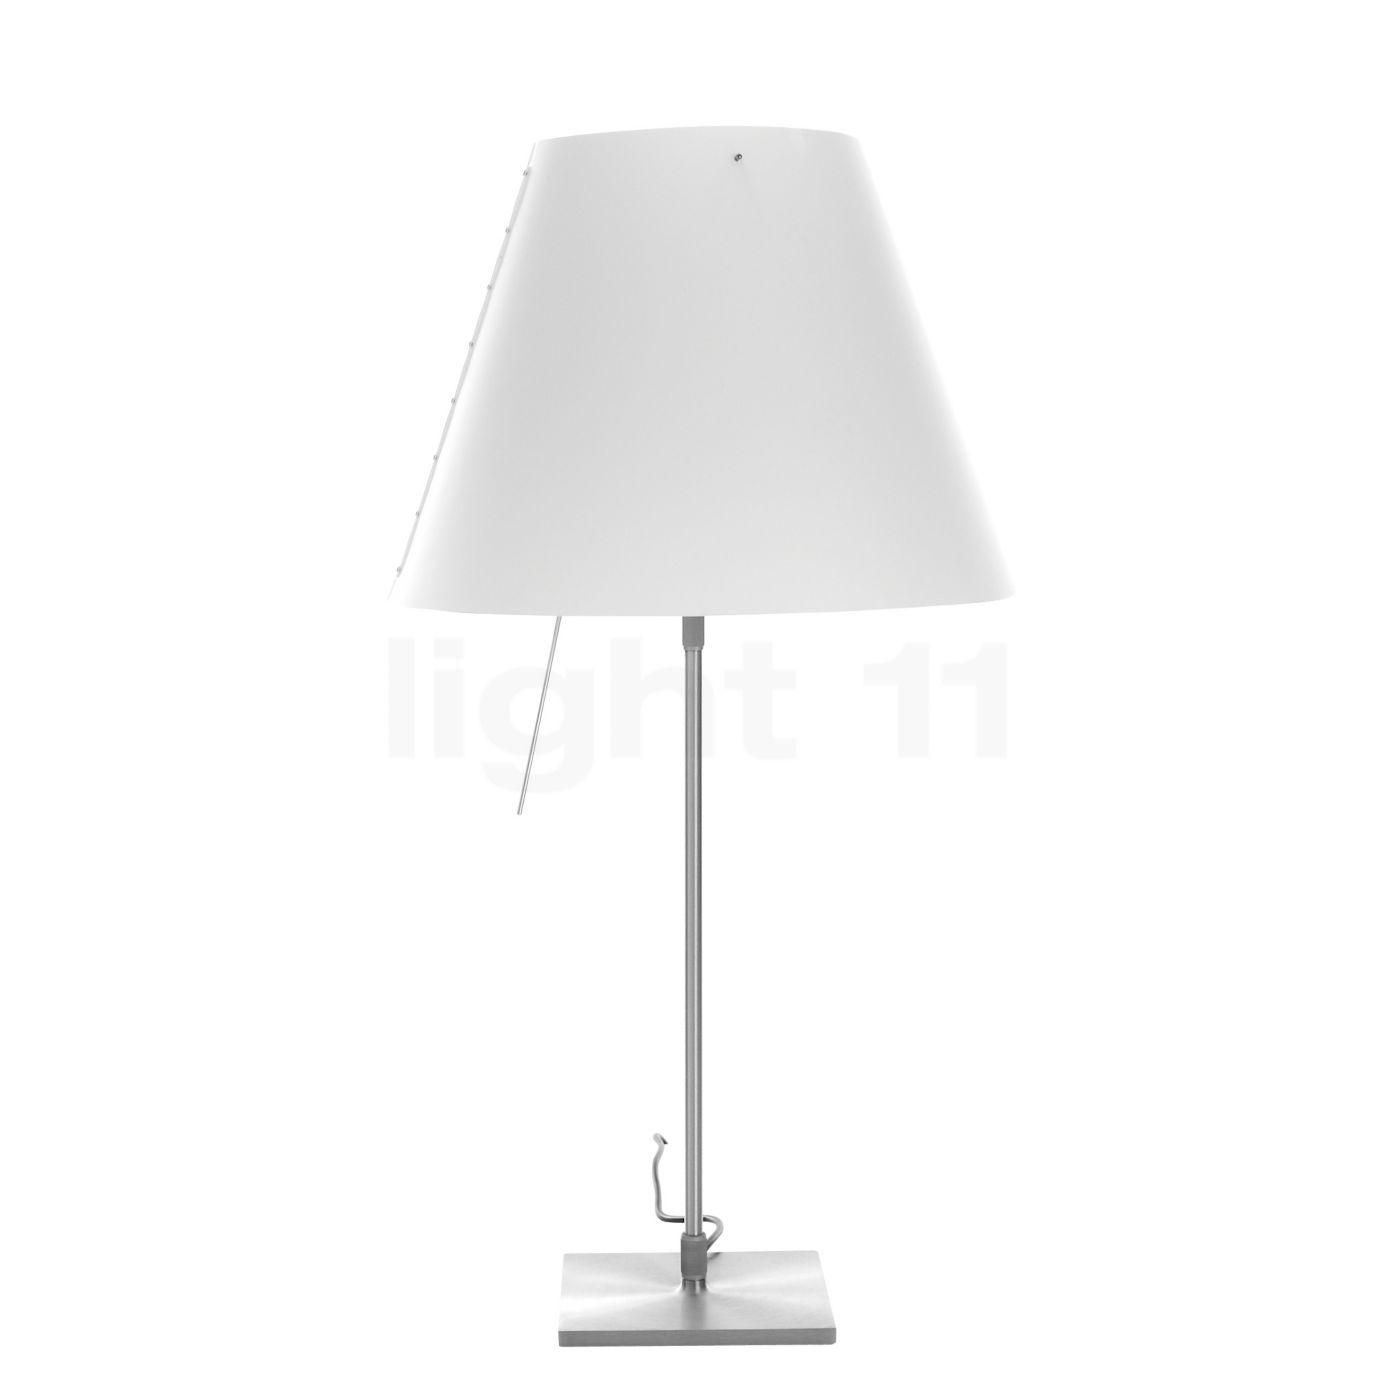 Bridgeamp; De Costanza Tavolo Ampoule Lampe Luceplan Lecture Avec mvNn8w0O